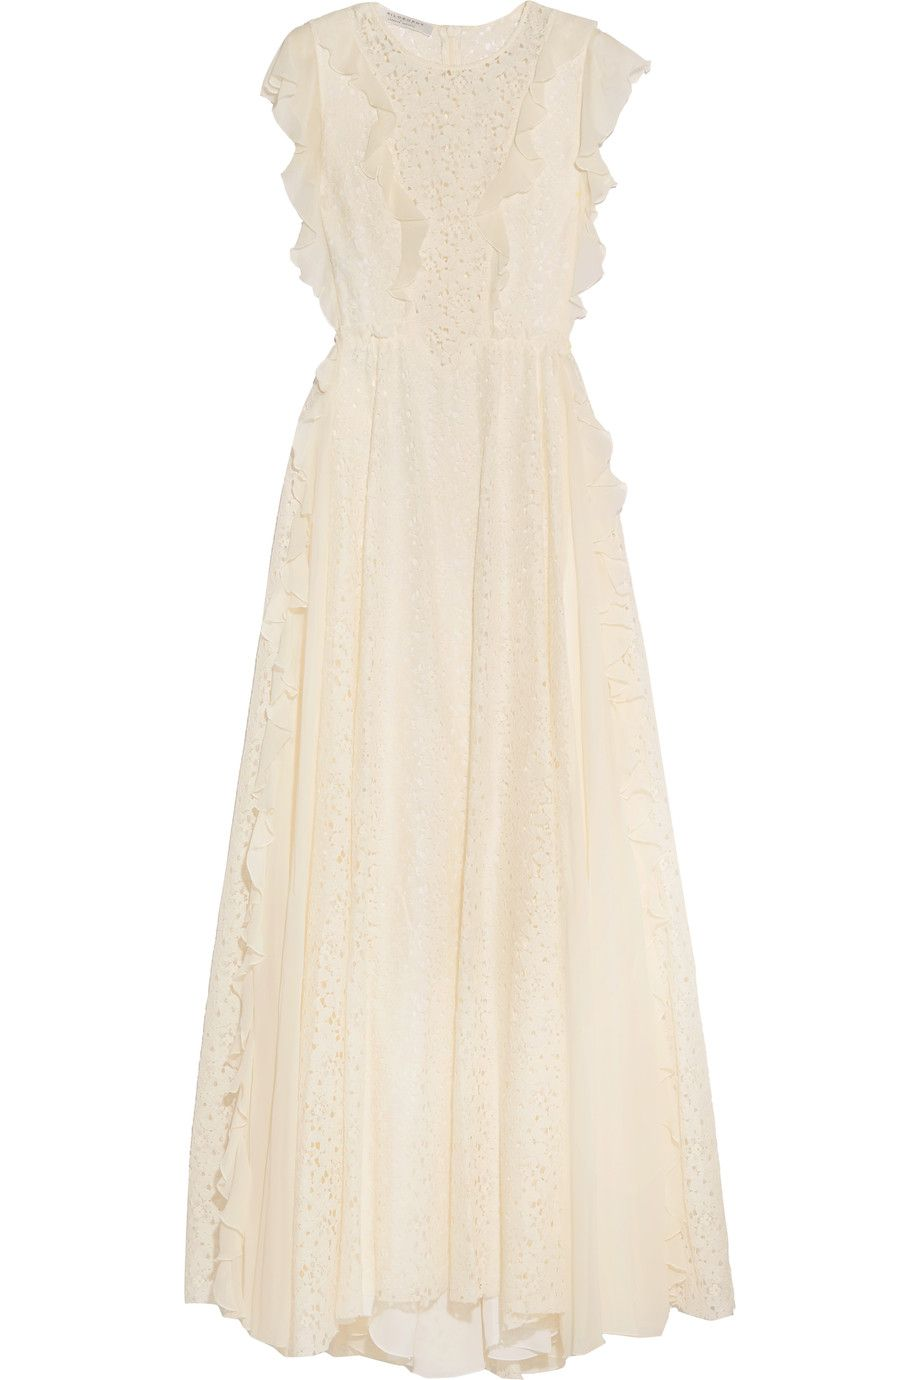 PHILOSOPHY DI LORENZO SERAFINI . #philosophydilorenzoserafini #cloth #gown